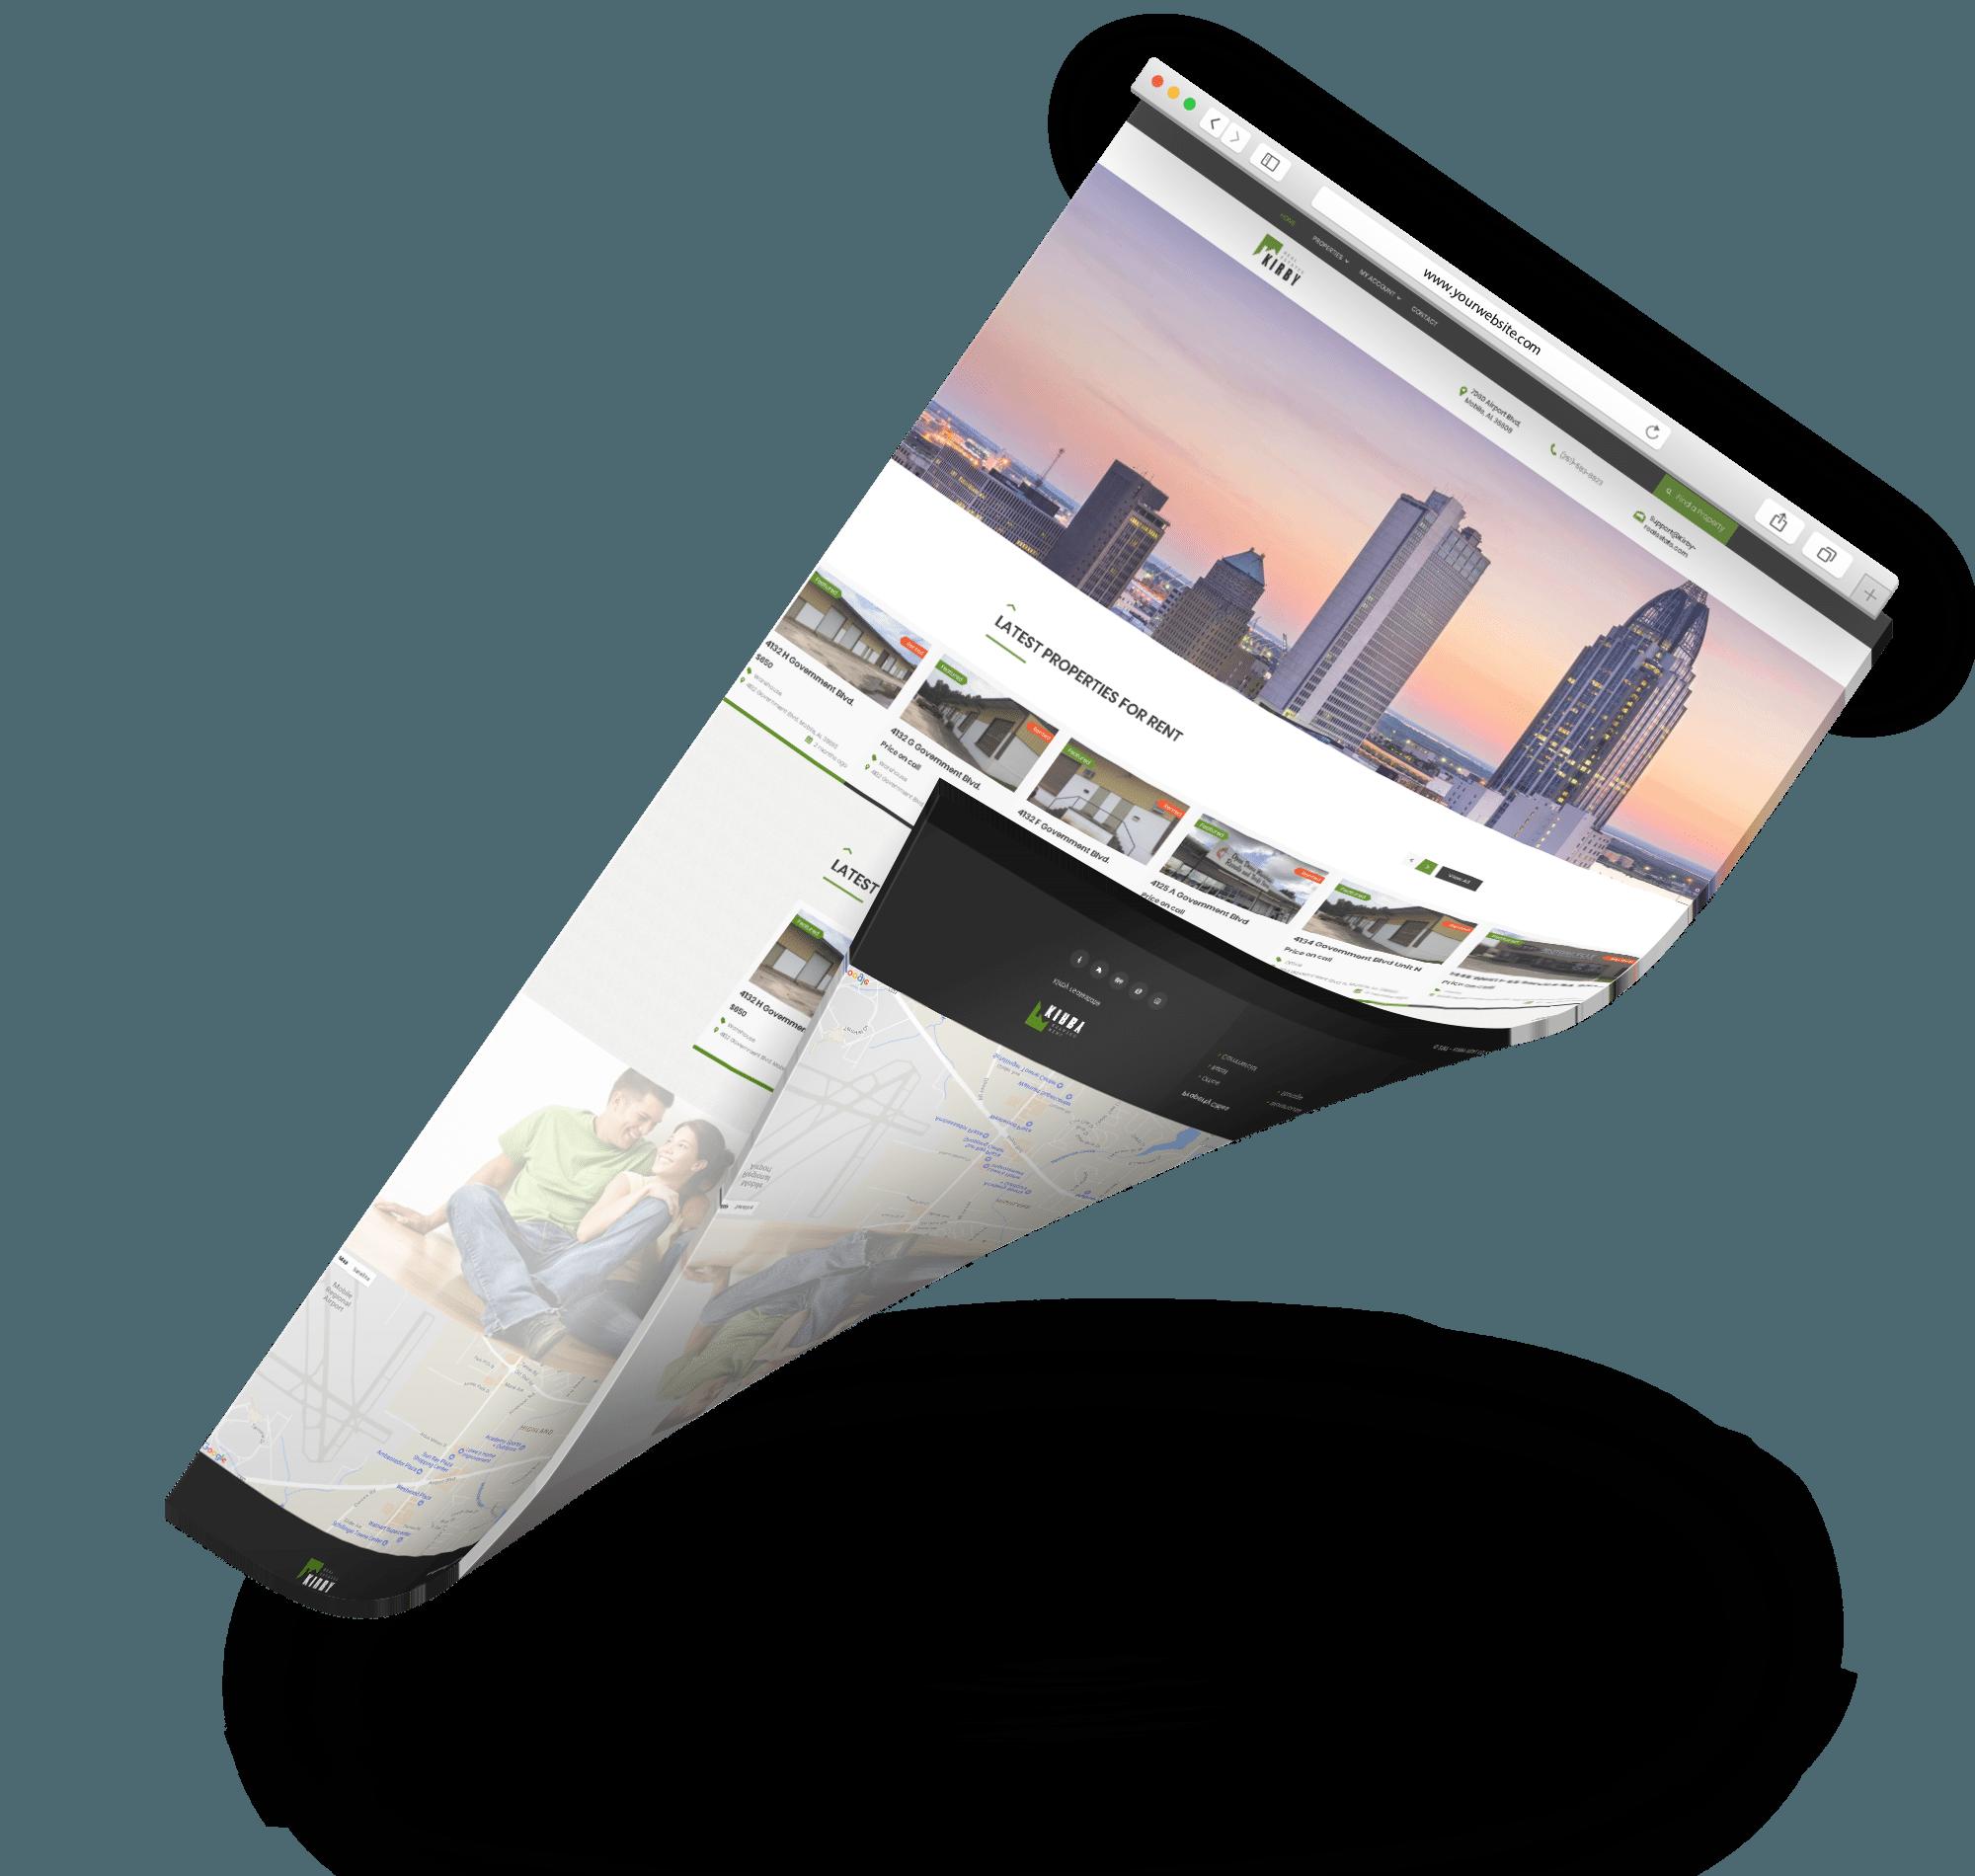 kirby real estate web design sem seo specialist